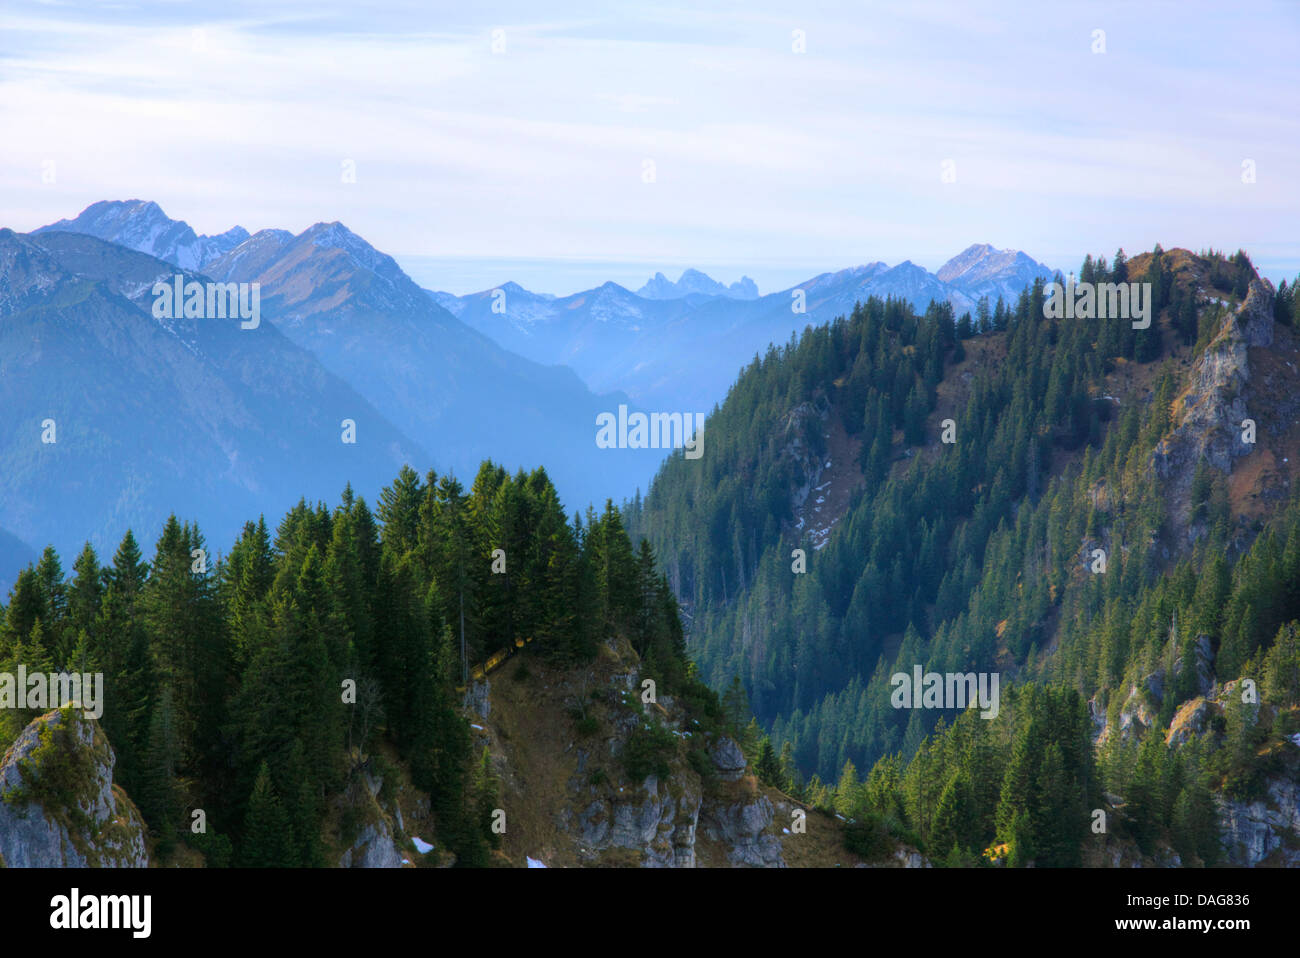 ammer mountains, Germany, Bavaria, Oberbayern, Upper Bavaria - Stock Image